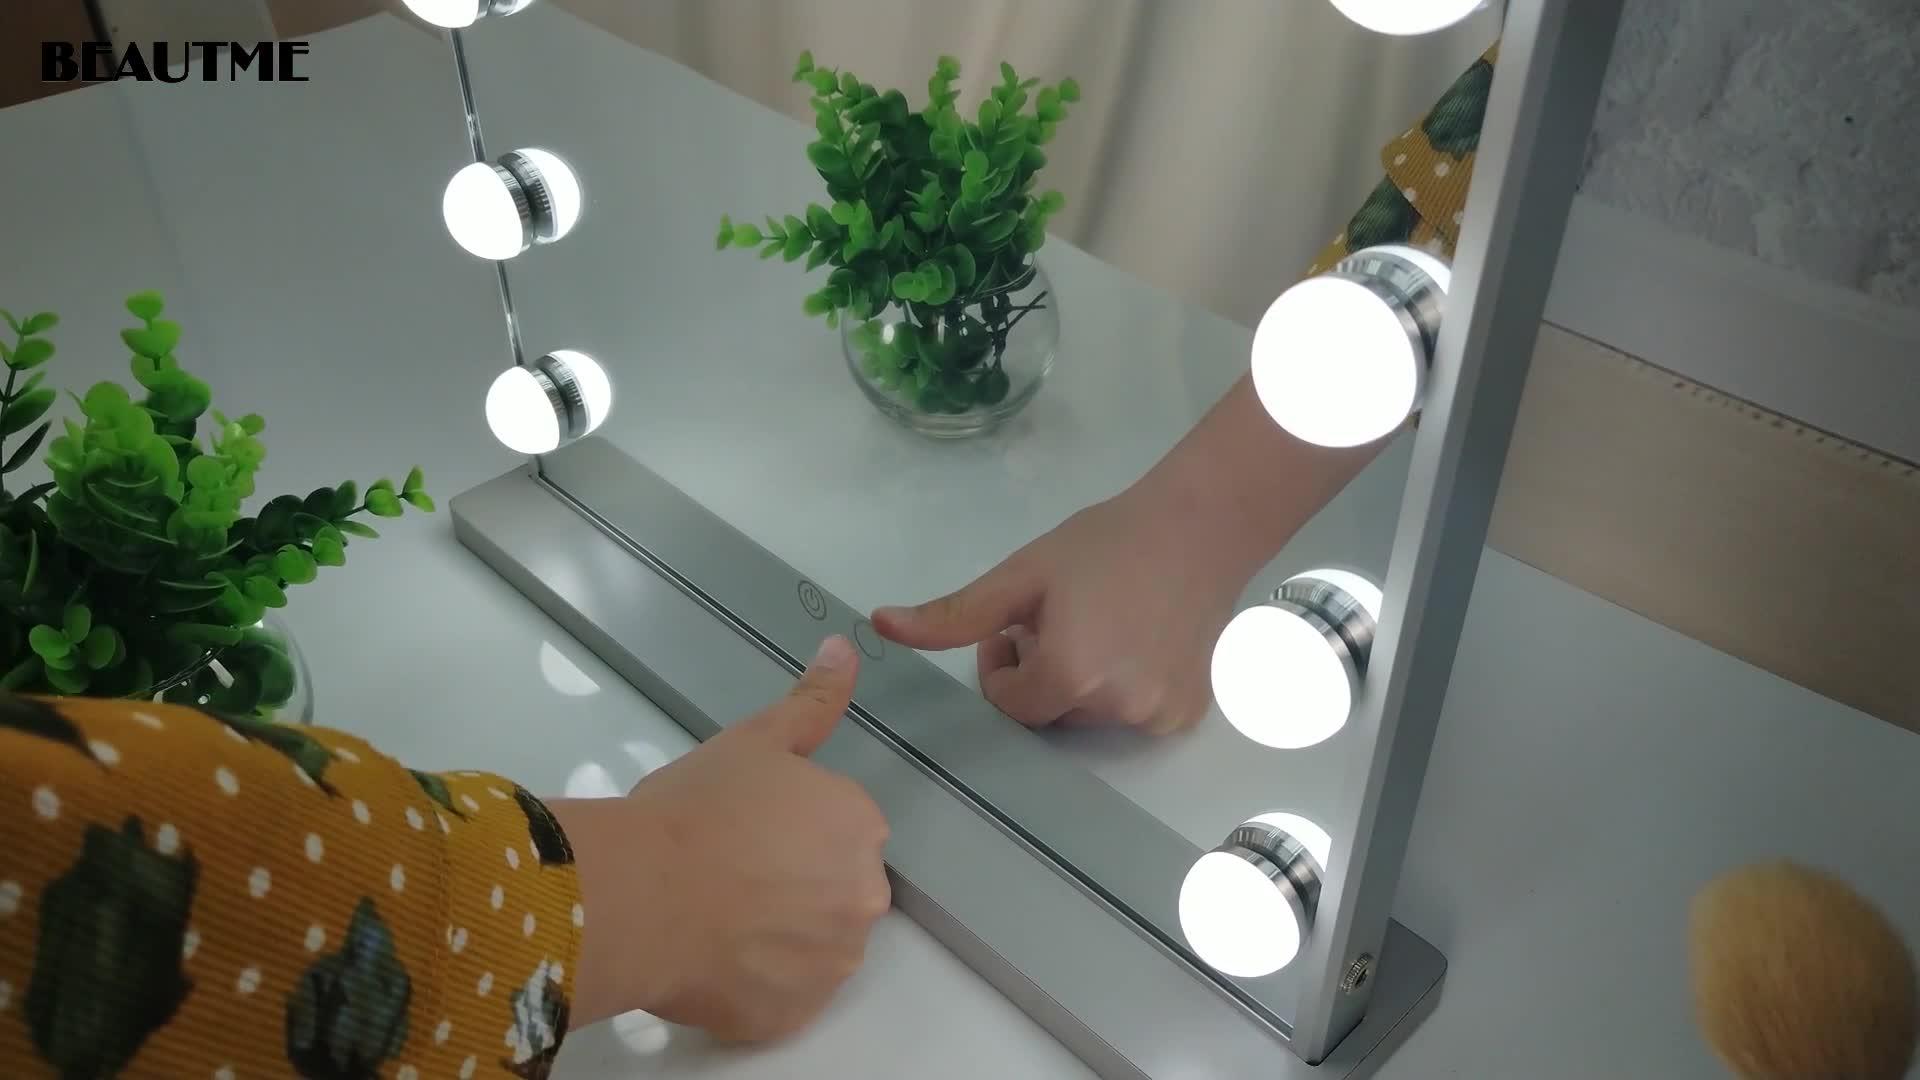 Beautme 15 전구 할리우드 허영 탁상 벽 마운트 뷰티 미러 조광기